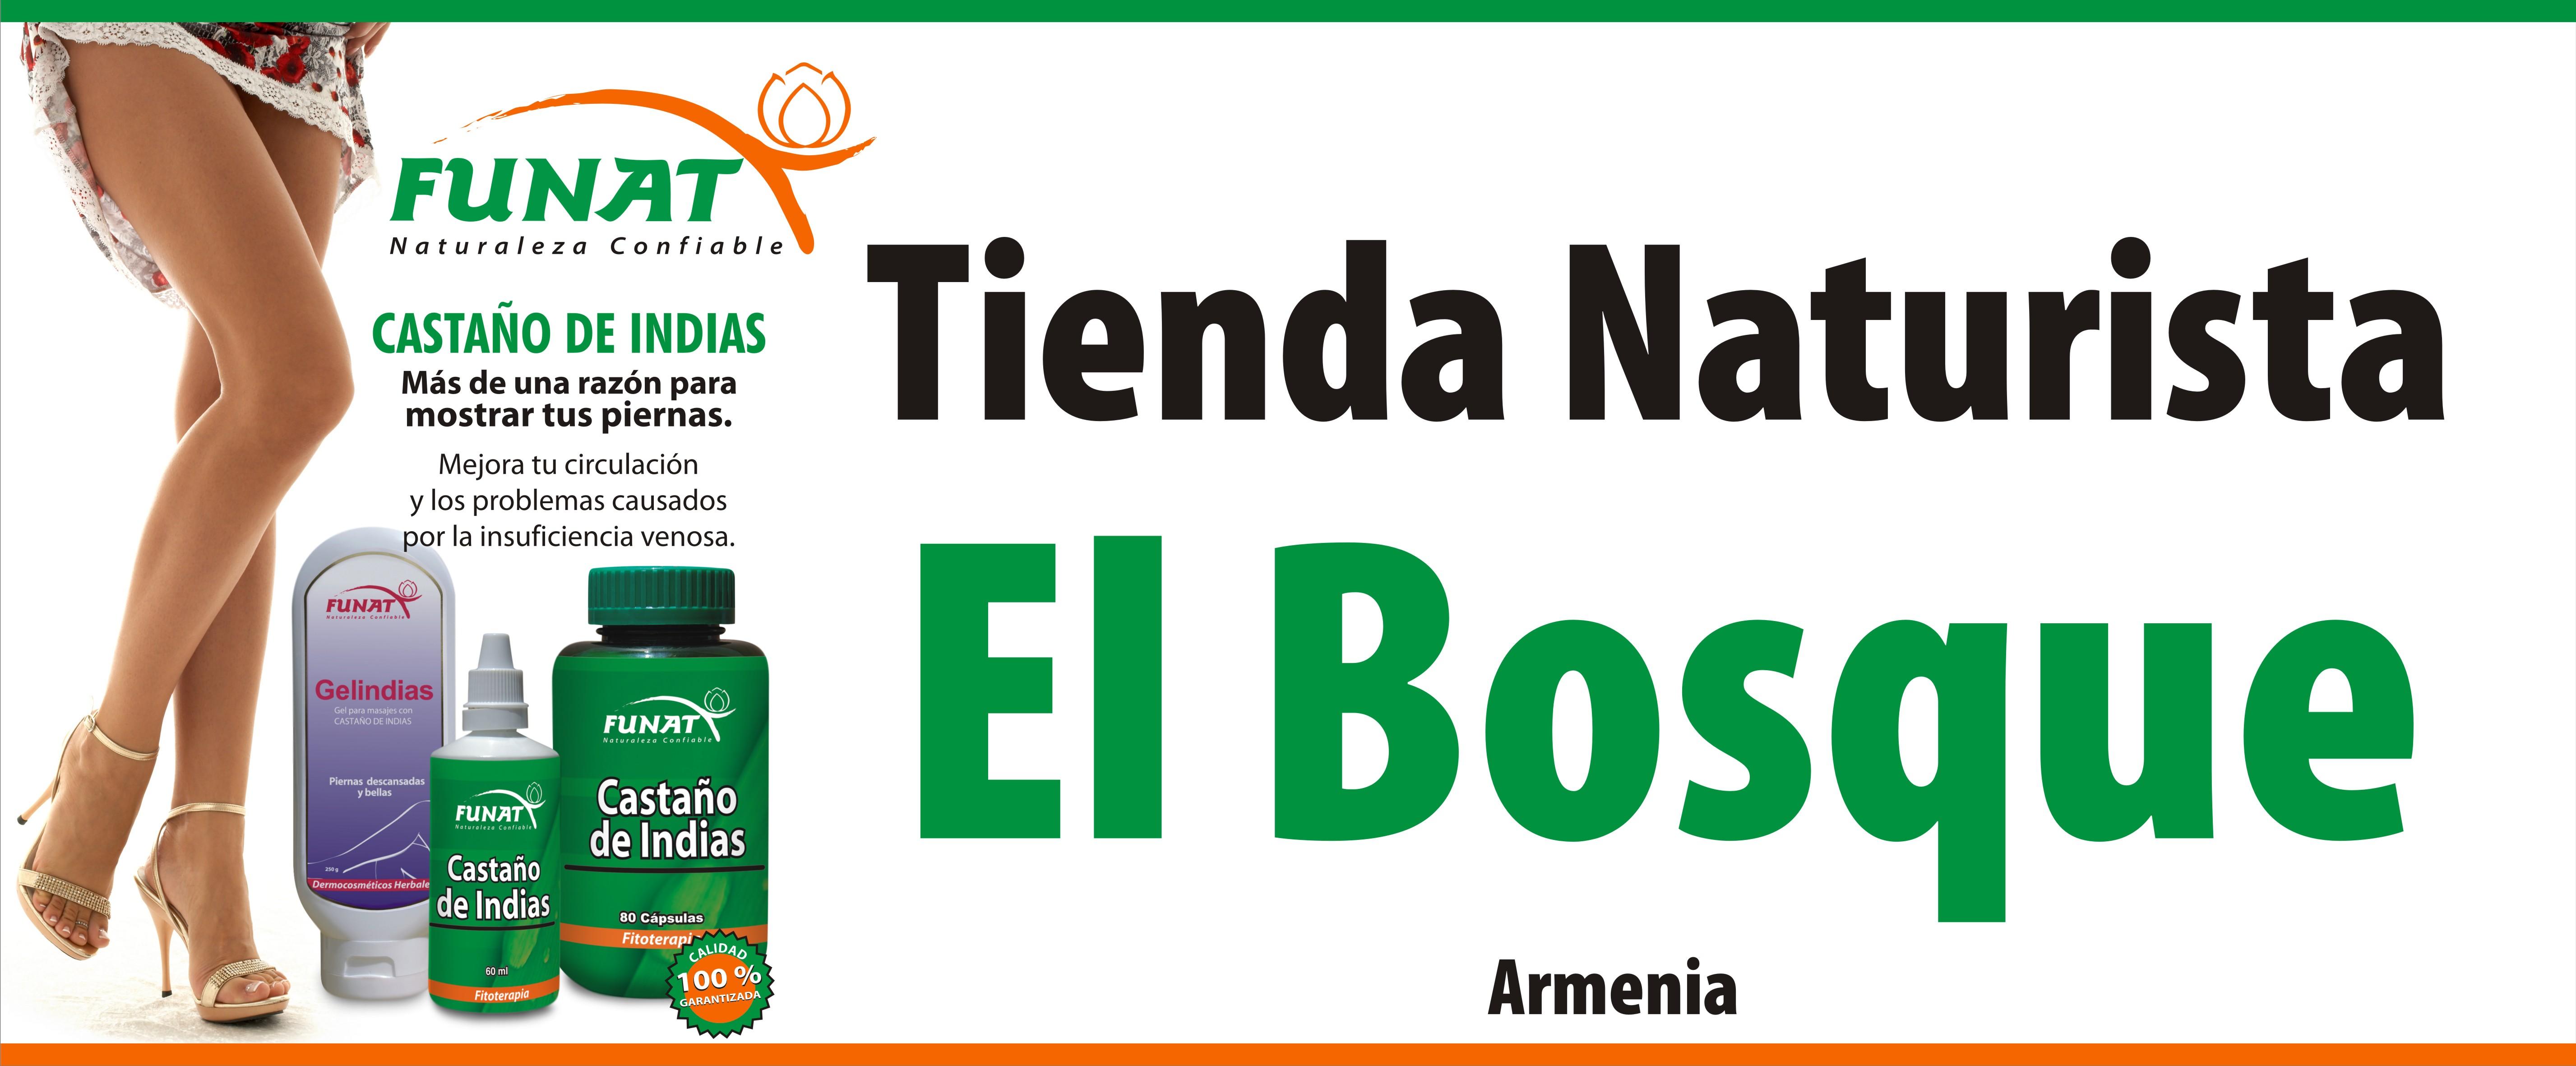 Tienda Naturista El Bosque Armenia